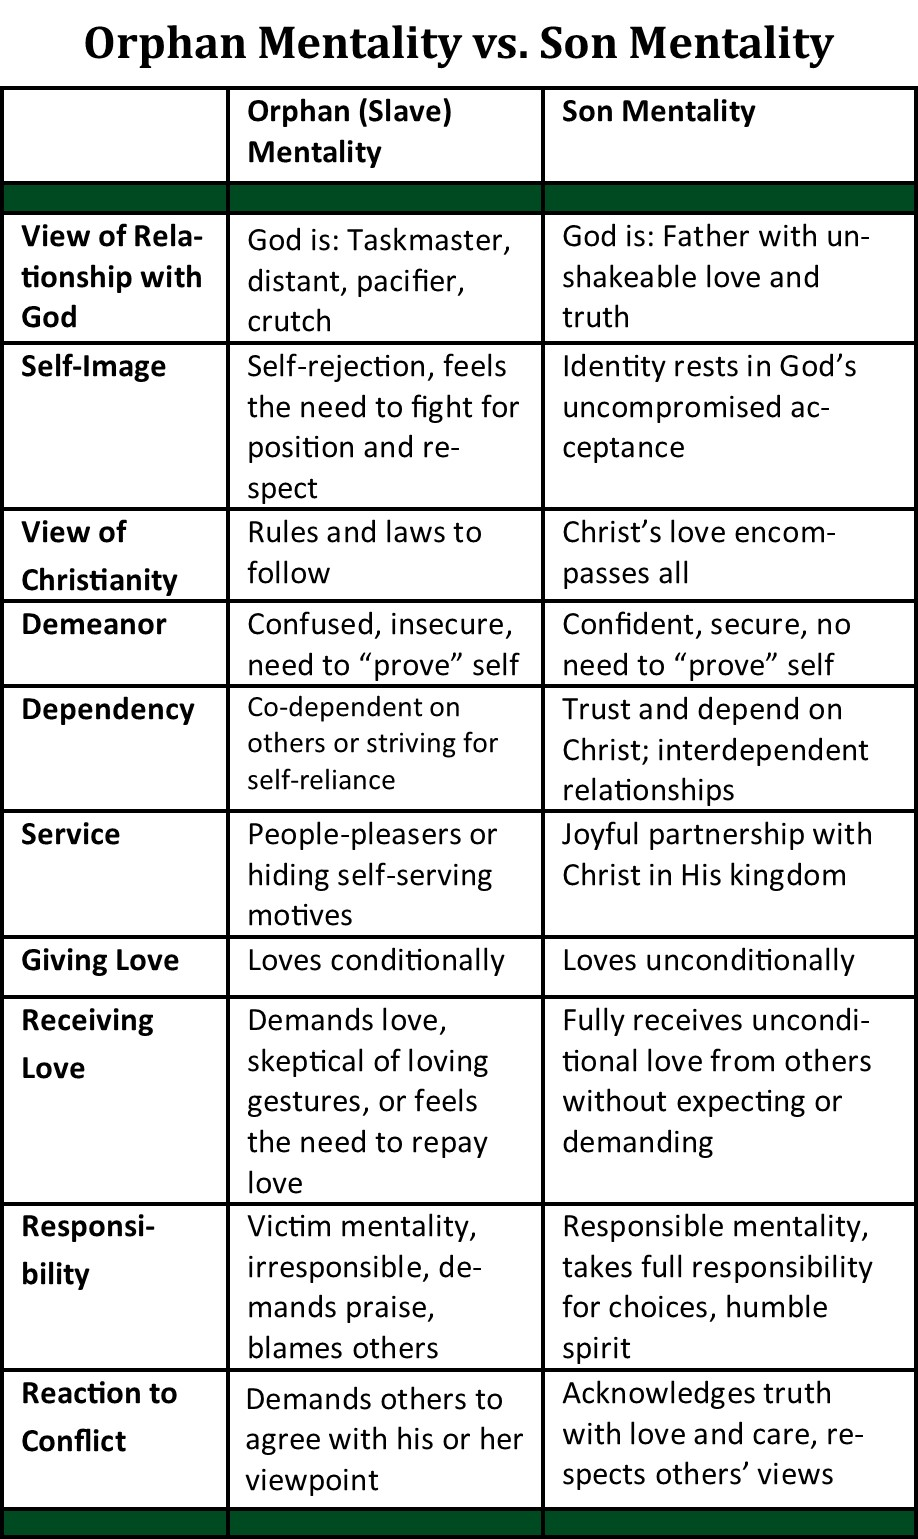 Orphan vs Son Mentality